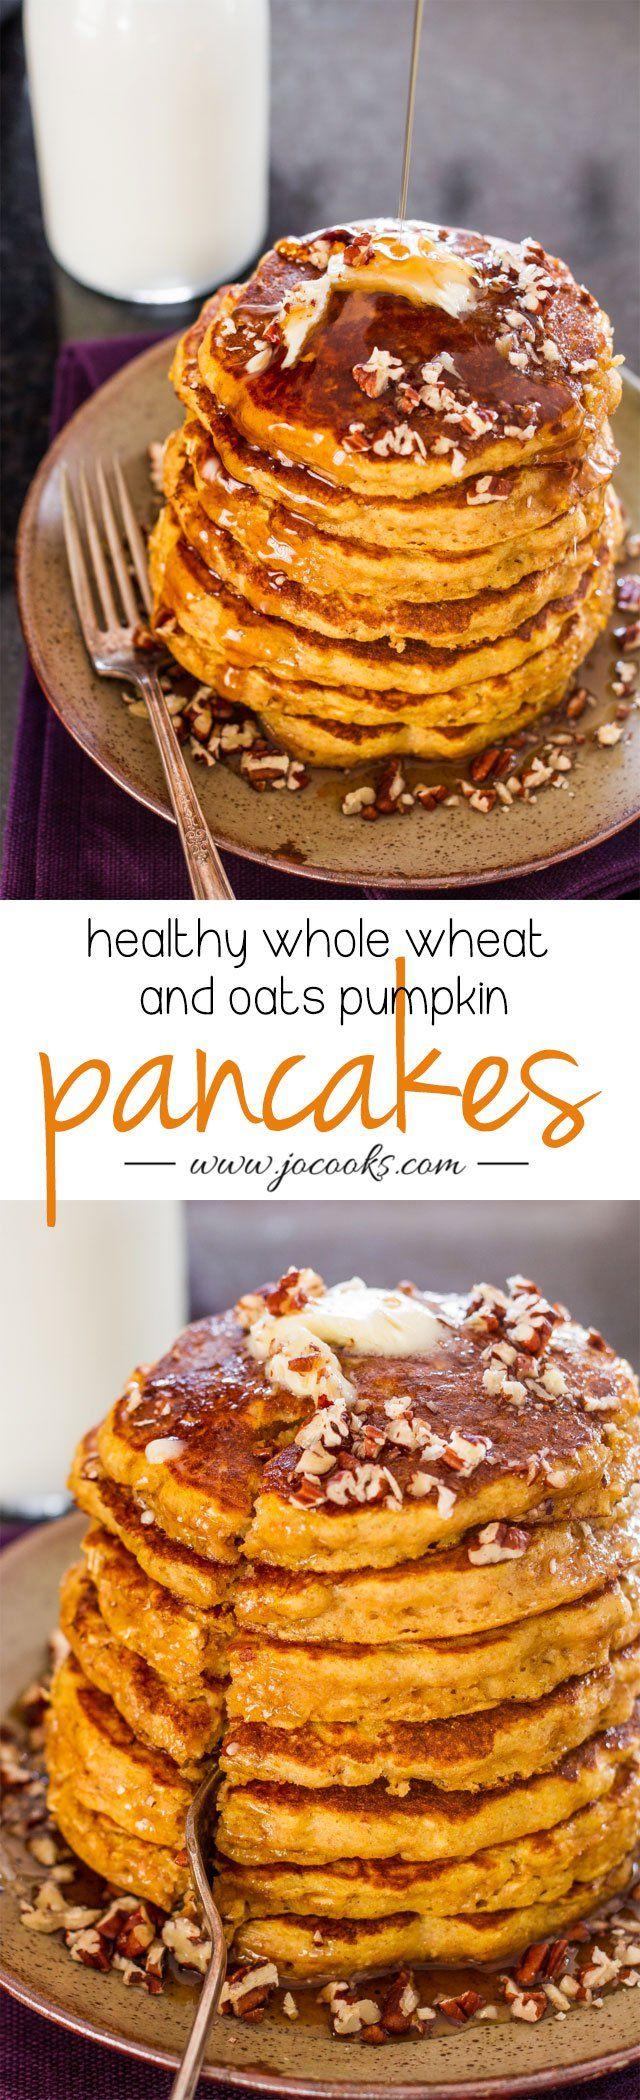 Healthy Whole Wheat and Oats Pumpkin Pancakes